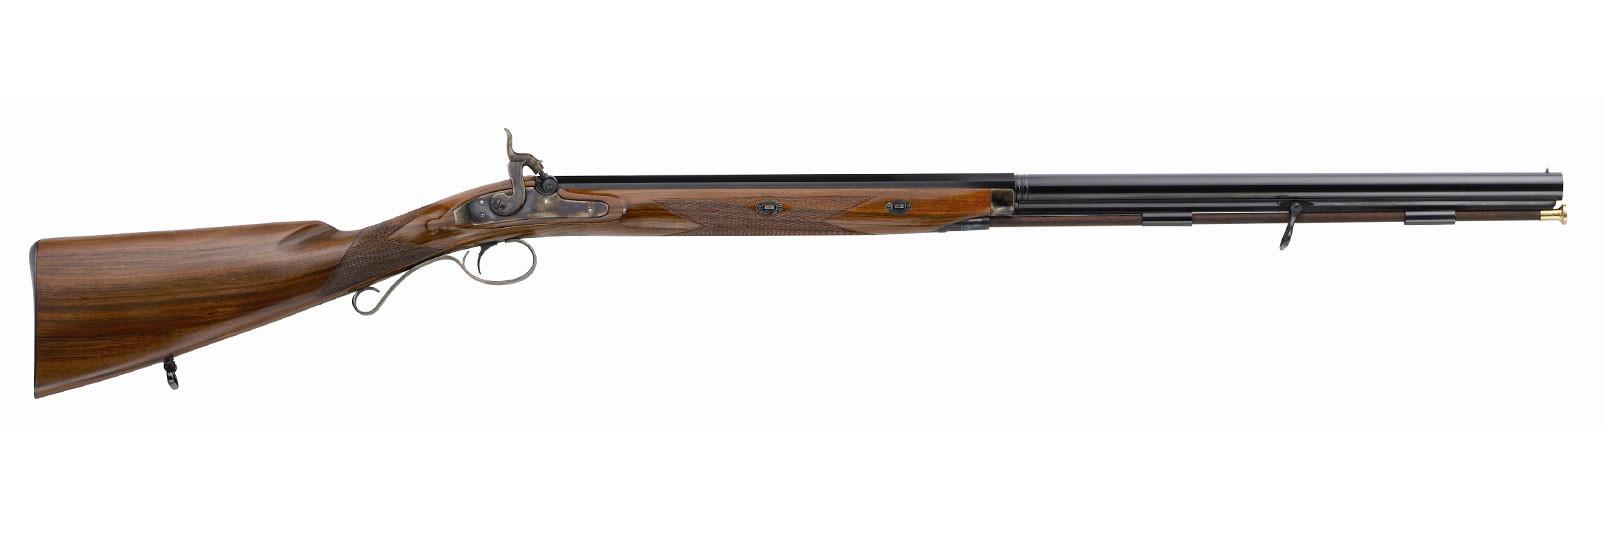 Mortimer Shotgun Rifle percussion model